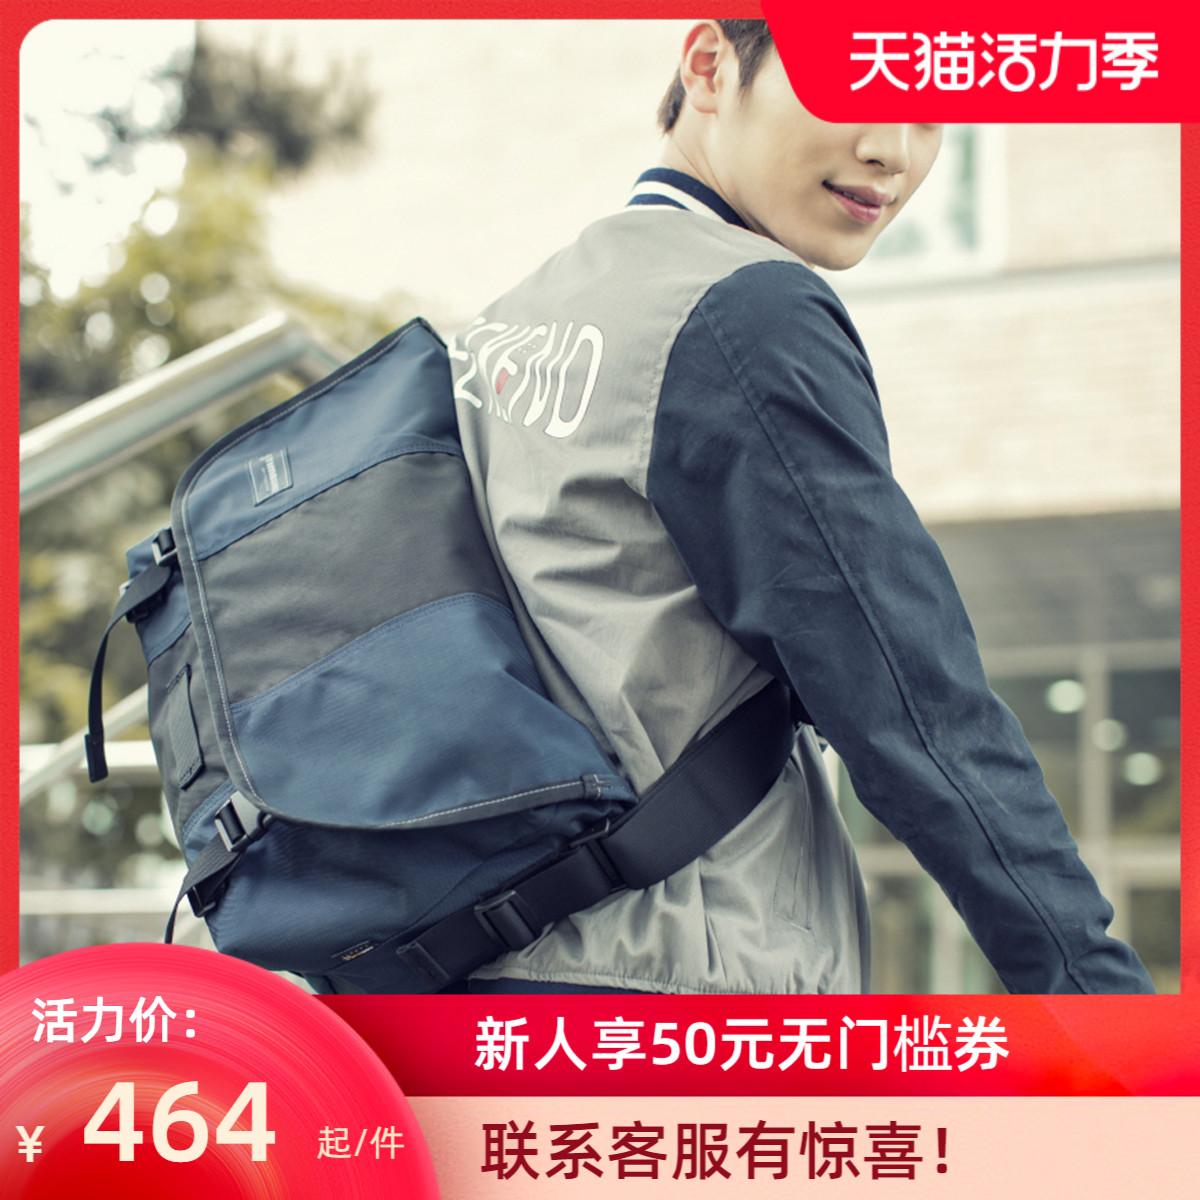 Timbuk2 postmans bag, Messengers bag, Messengers bag, trendy sports bag, mens and womens bag, college students bag, trendy brand